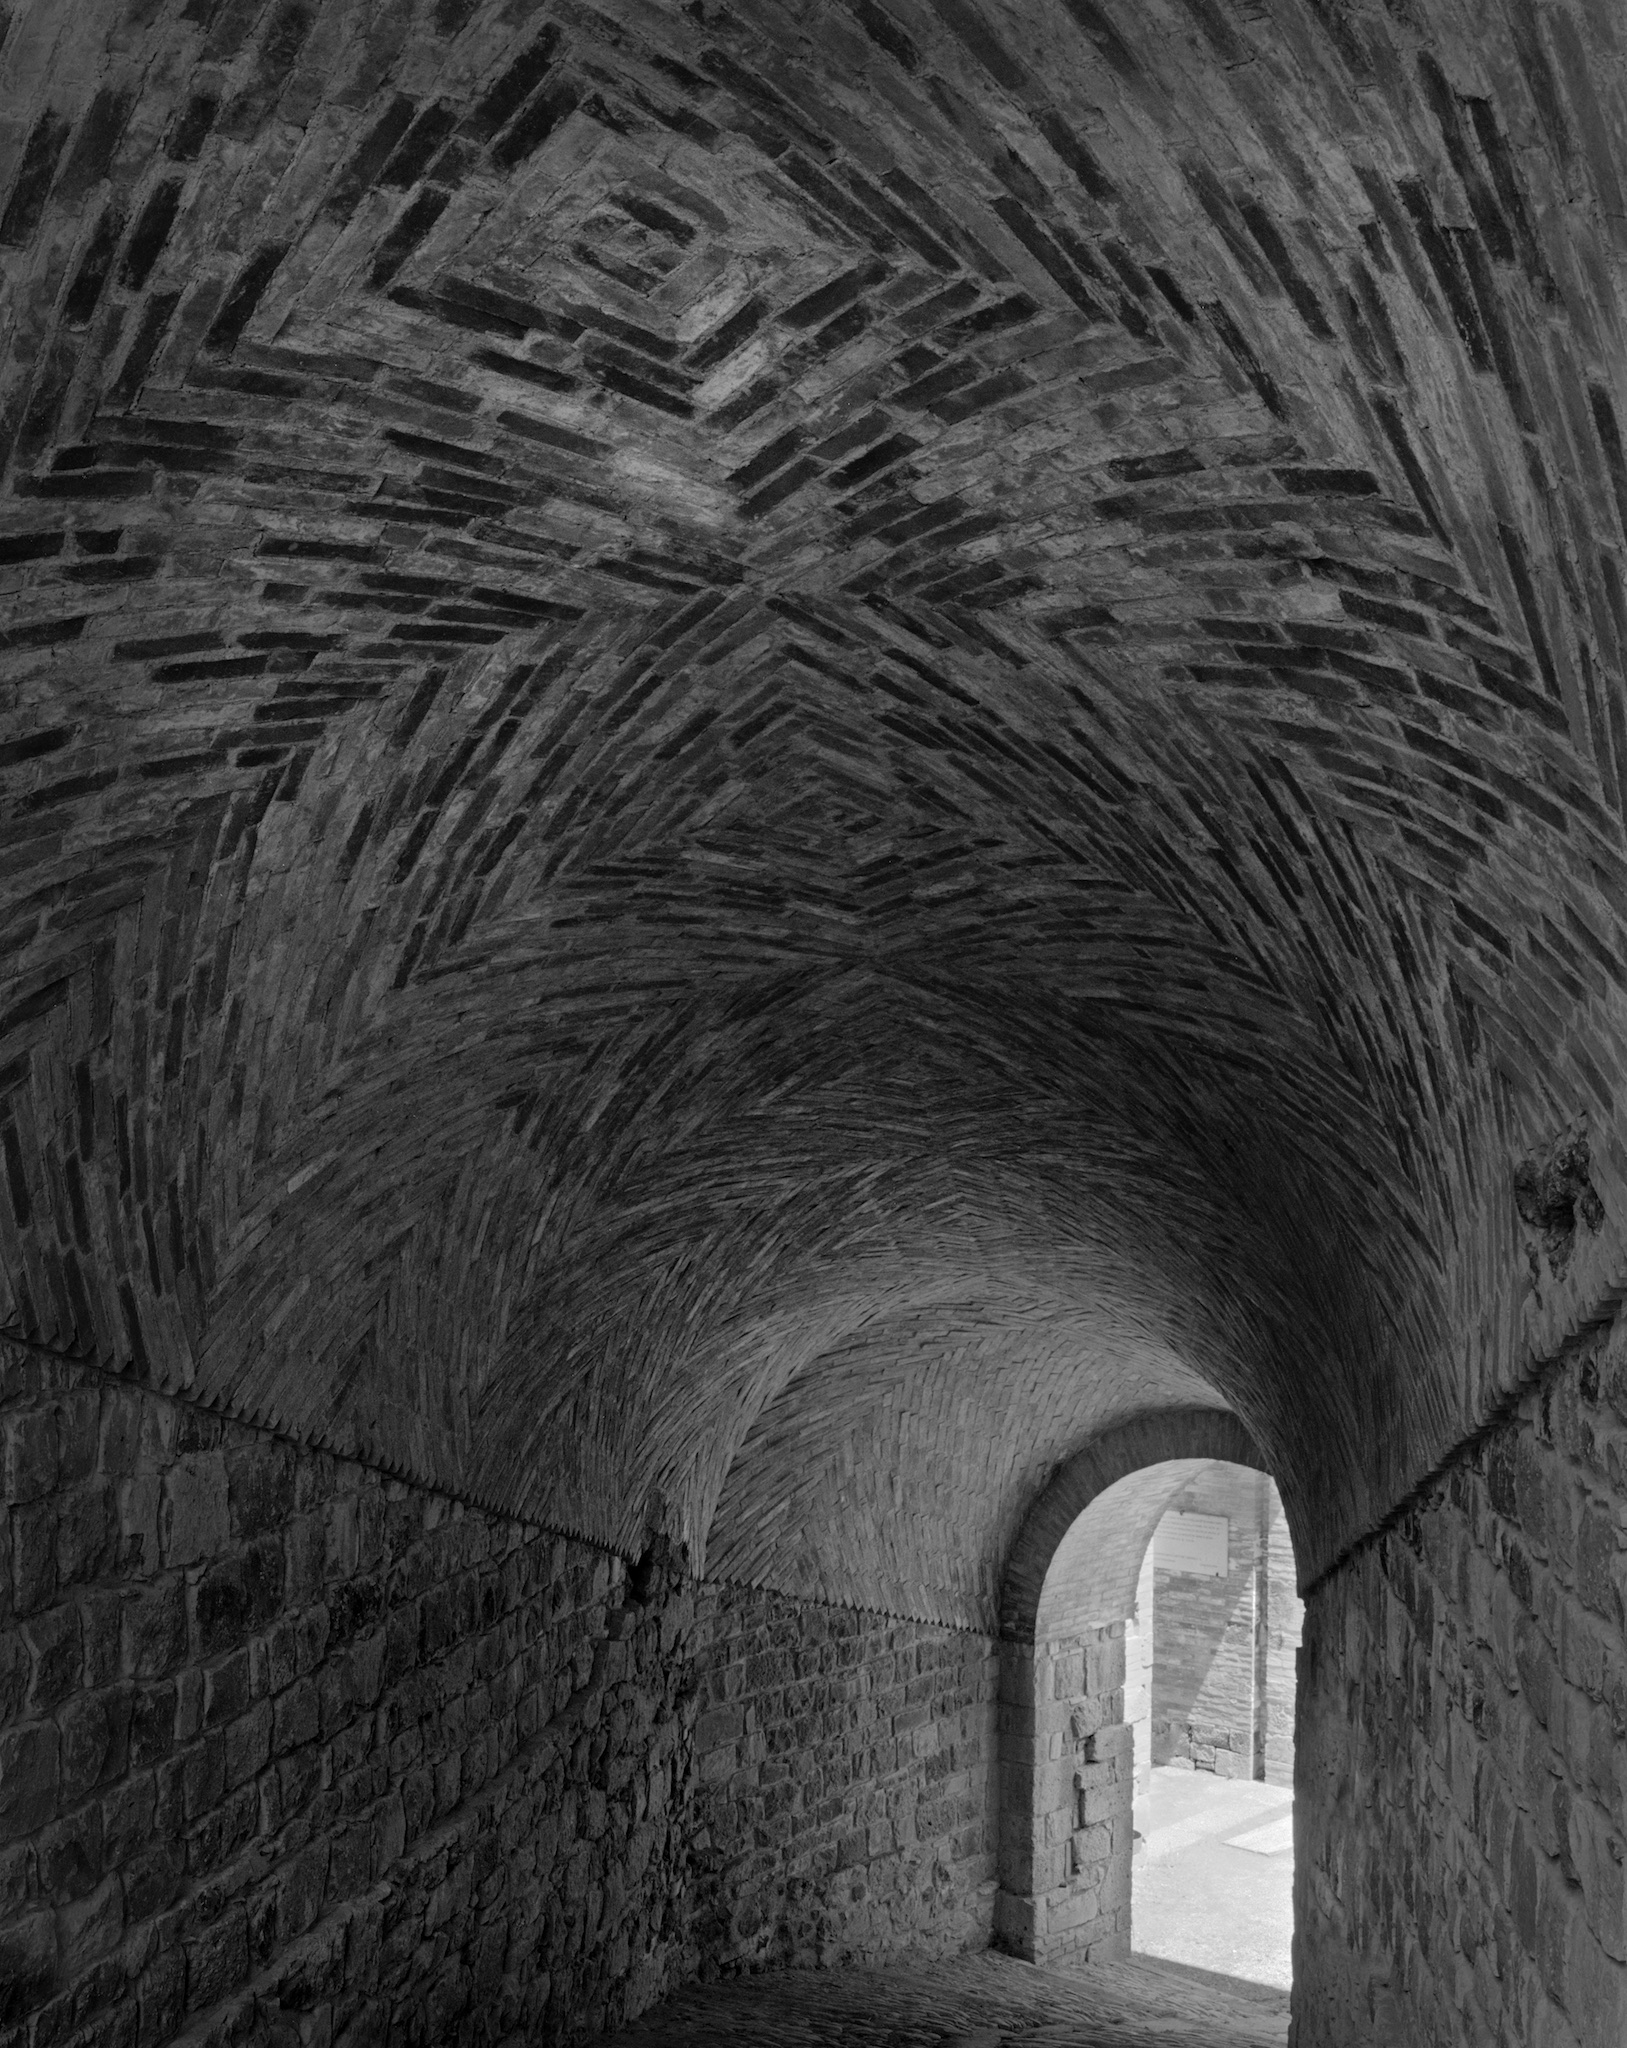 Castello, Toscana